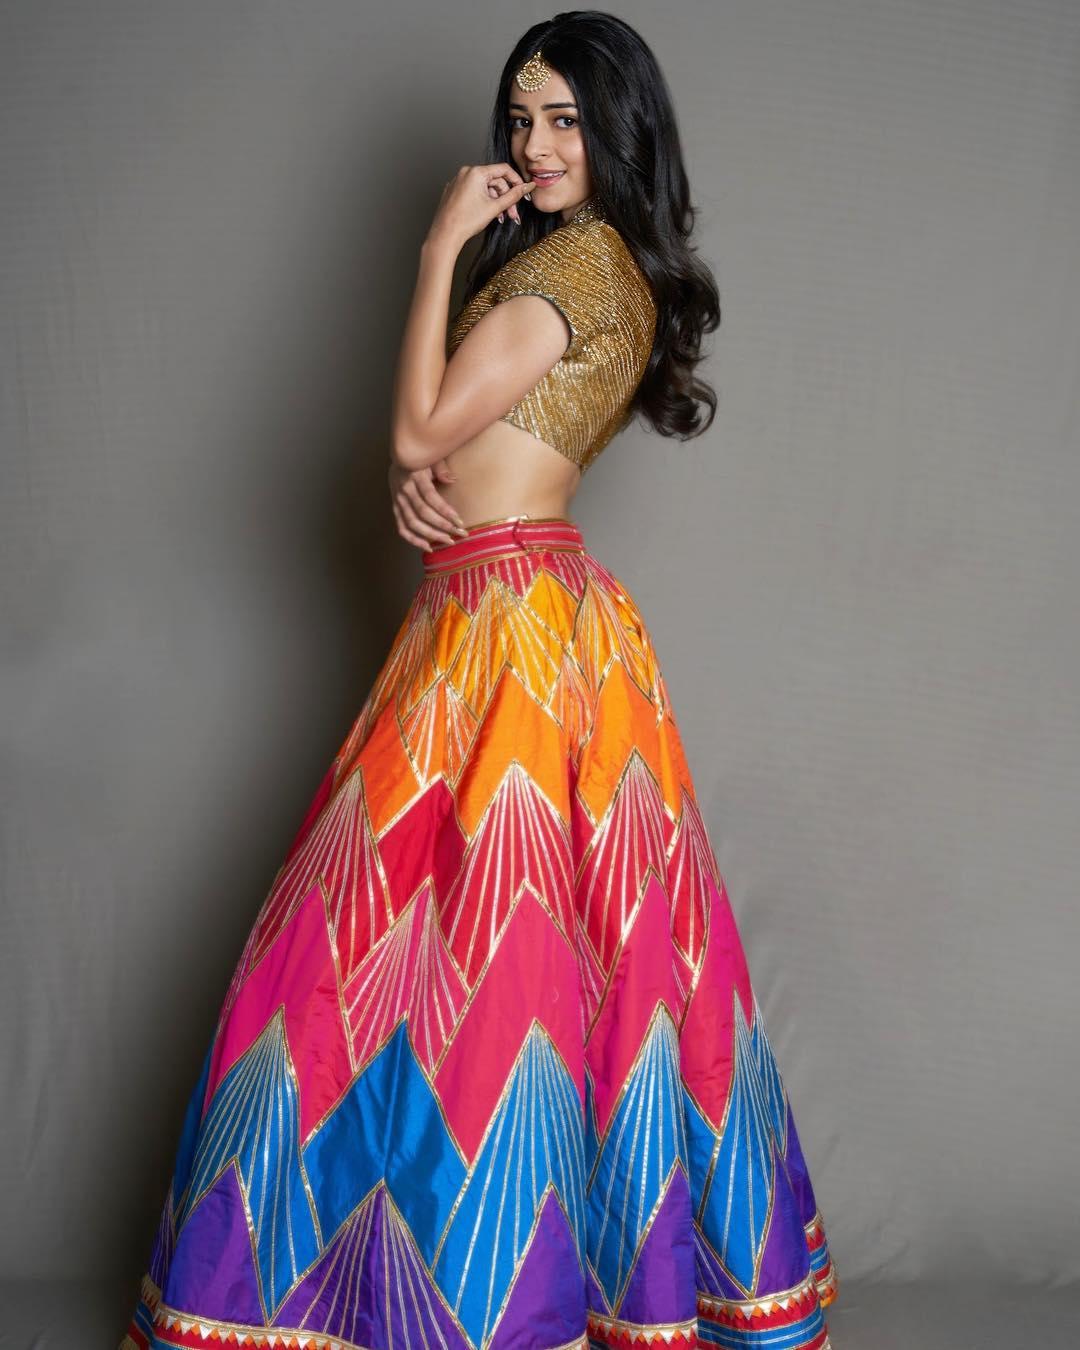 Cutest Ananya Pandey